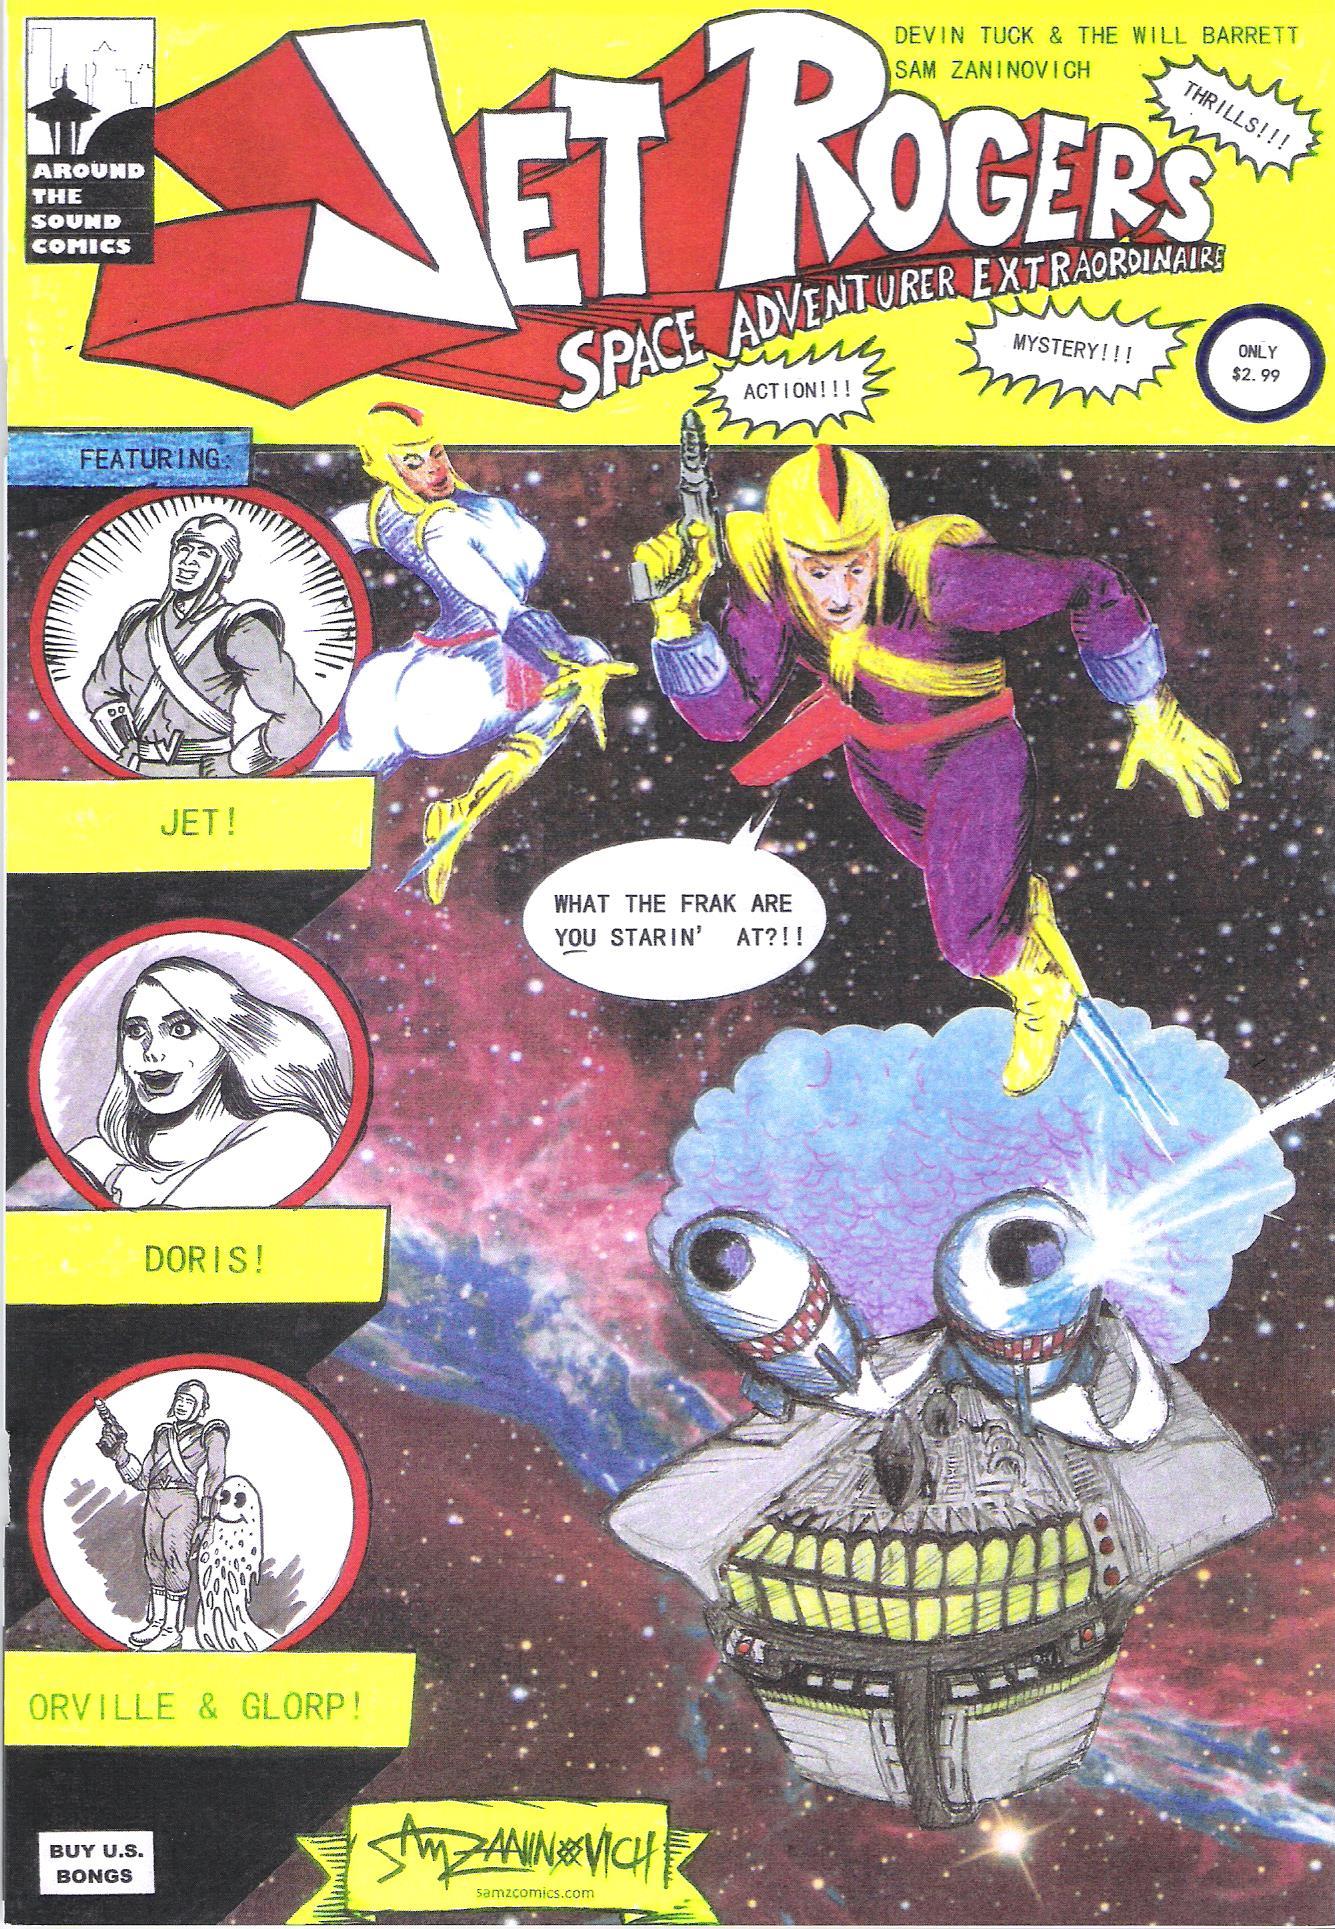 Jet Rogers #1 by Sam Zaninovich